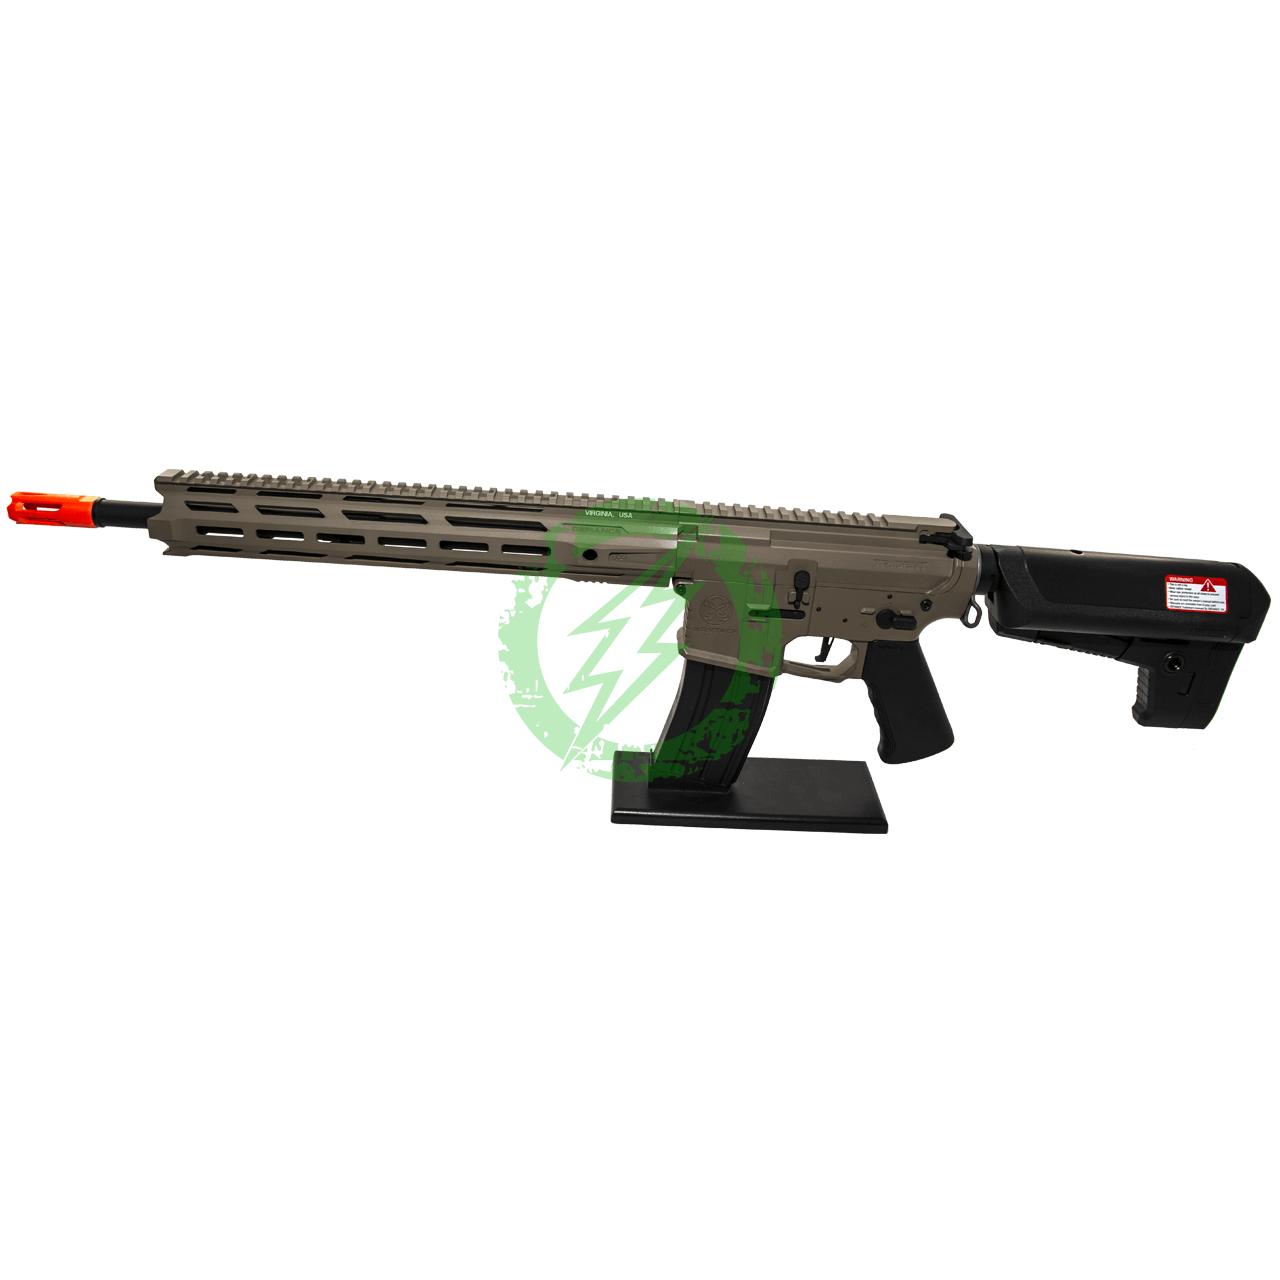 Amped Custom HPA Rifle Krytac MKII-M SPR | Flat Dark Earth Left Side